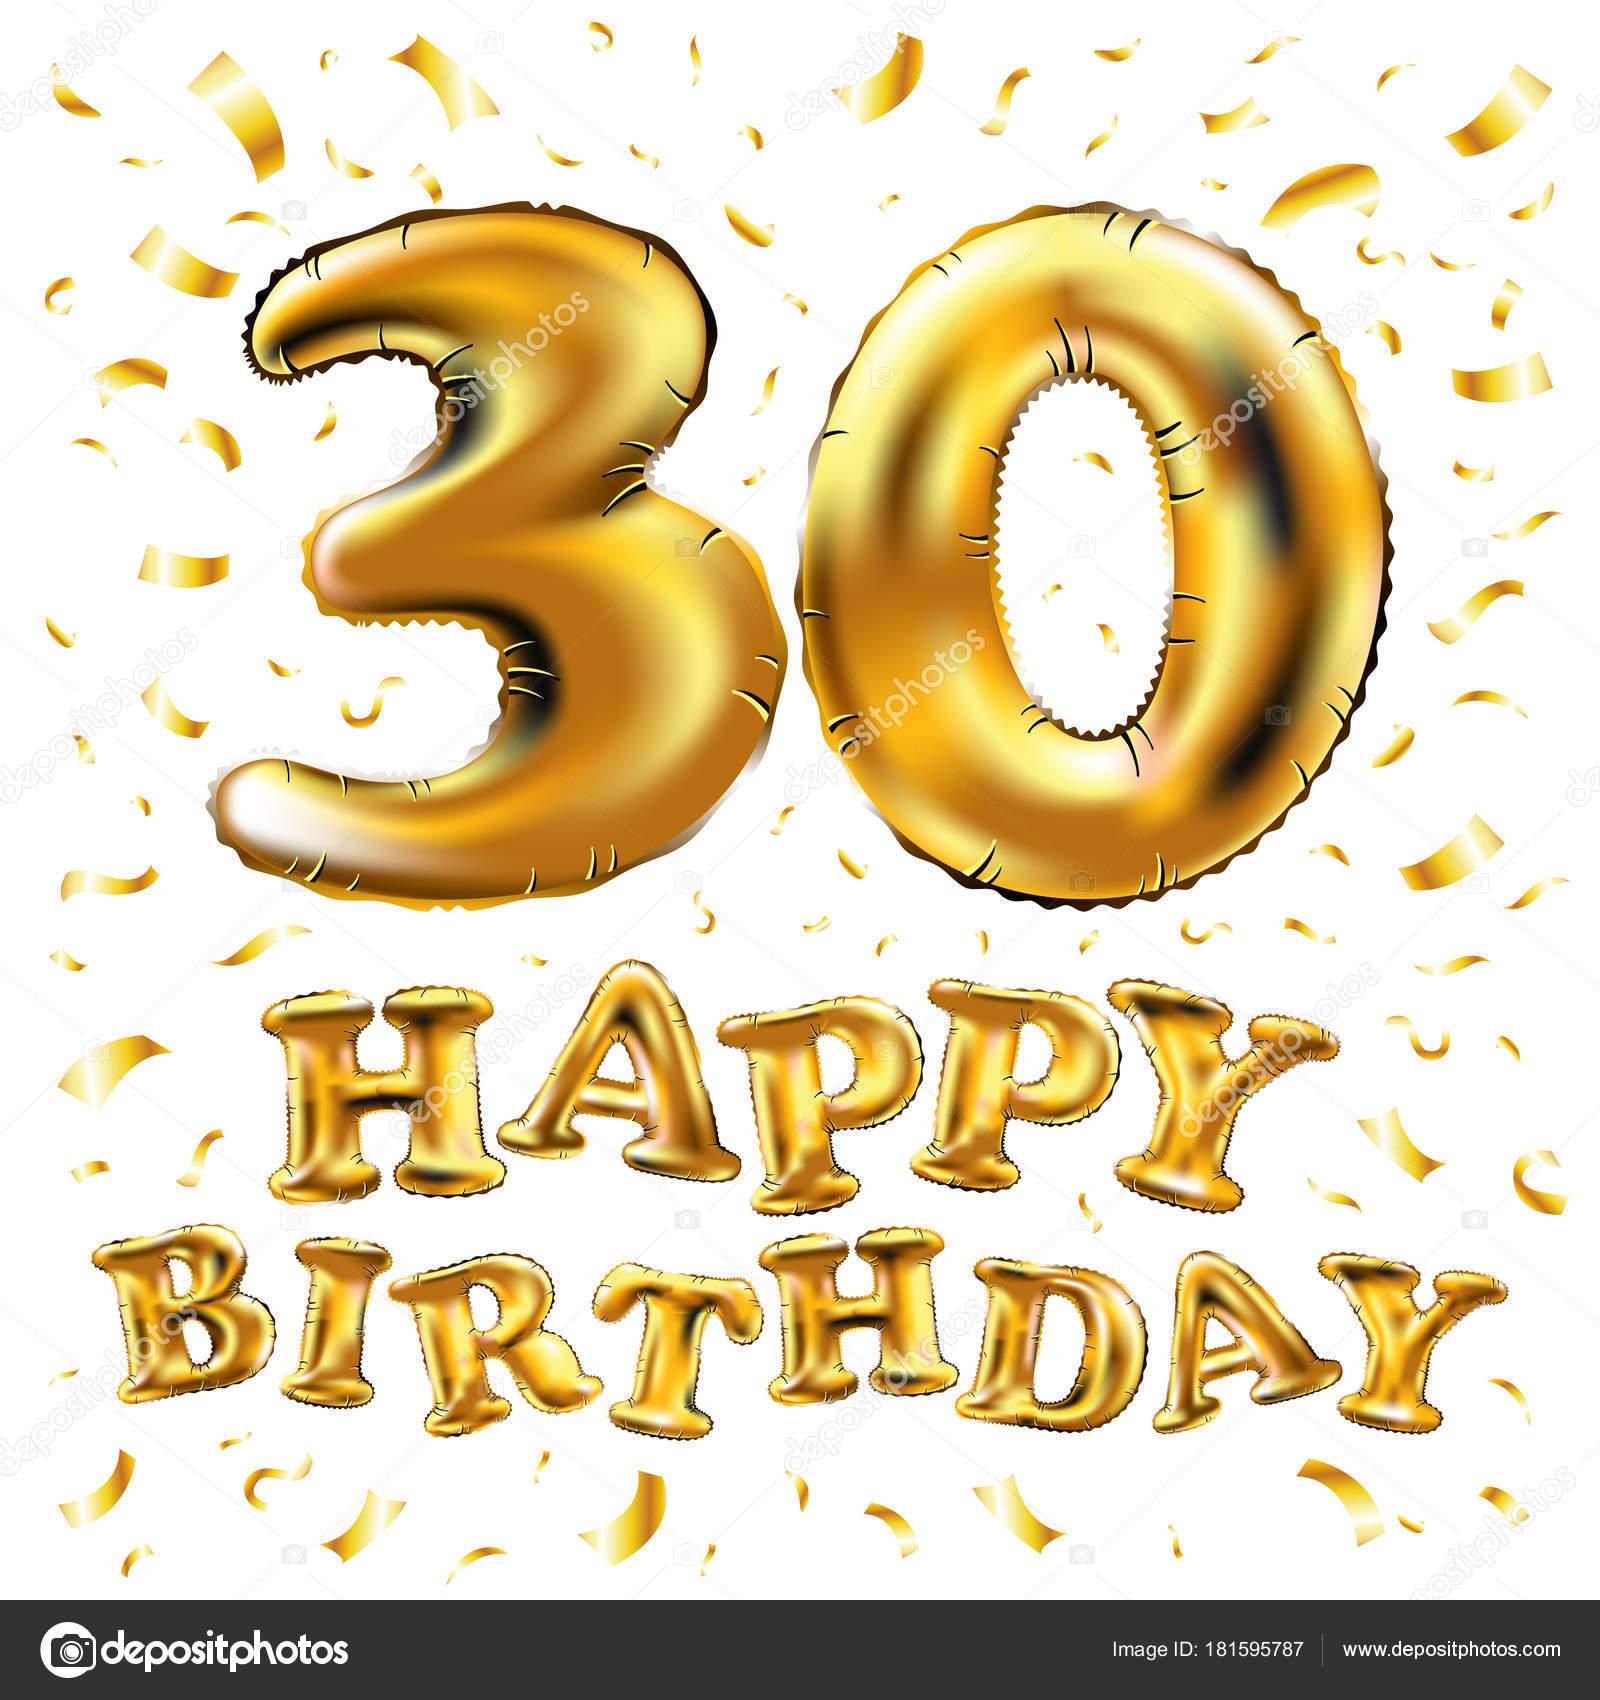 Feliz cumpleanos en tus 30 anos